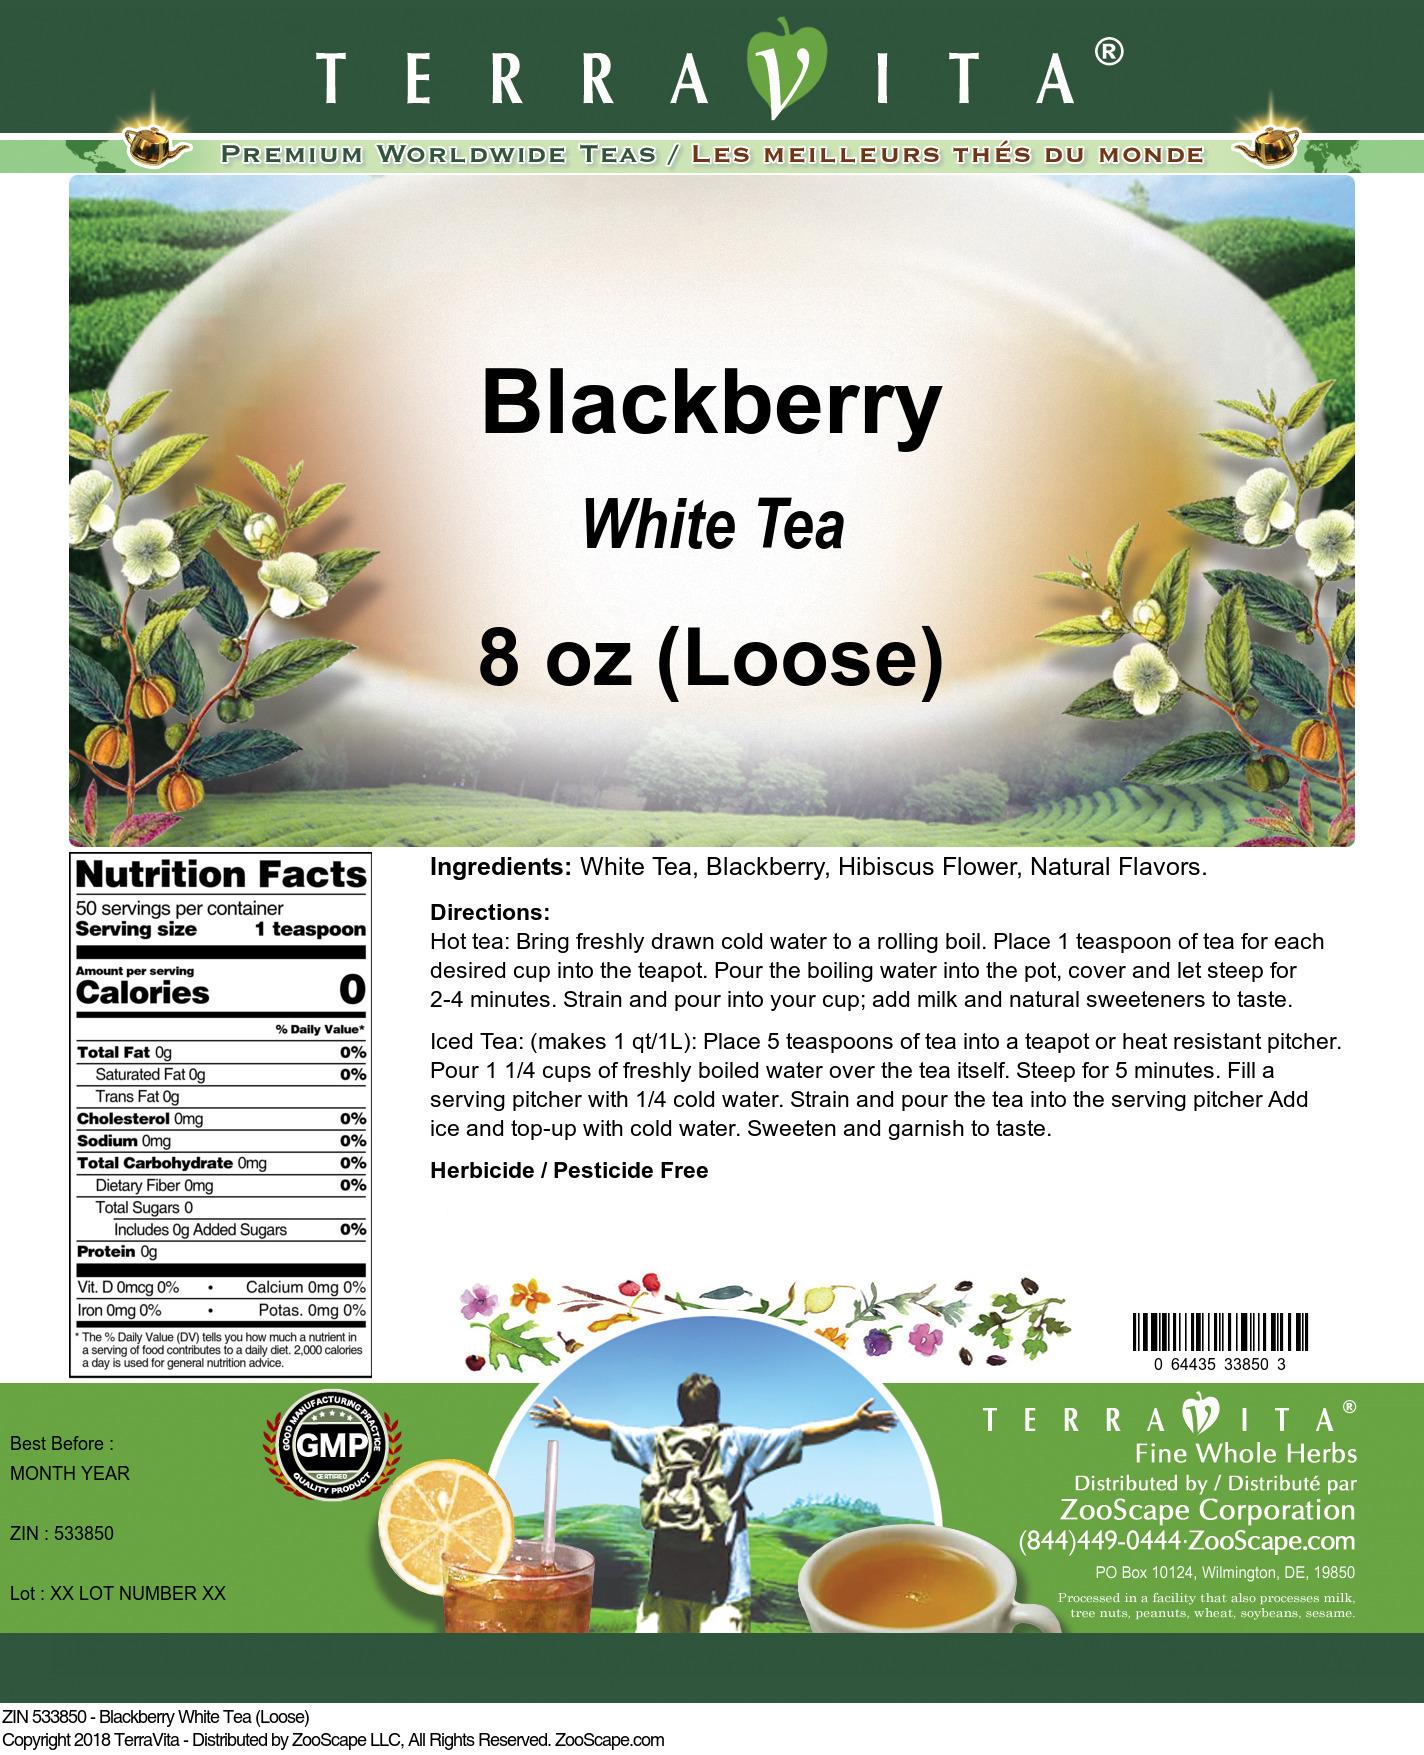 Blackberry White Tea (Loose)